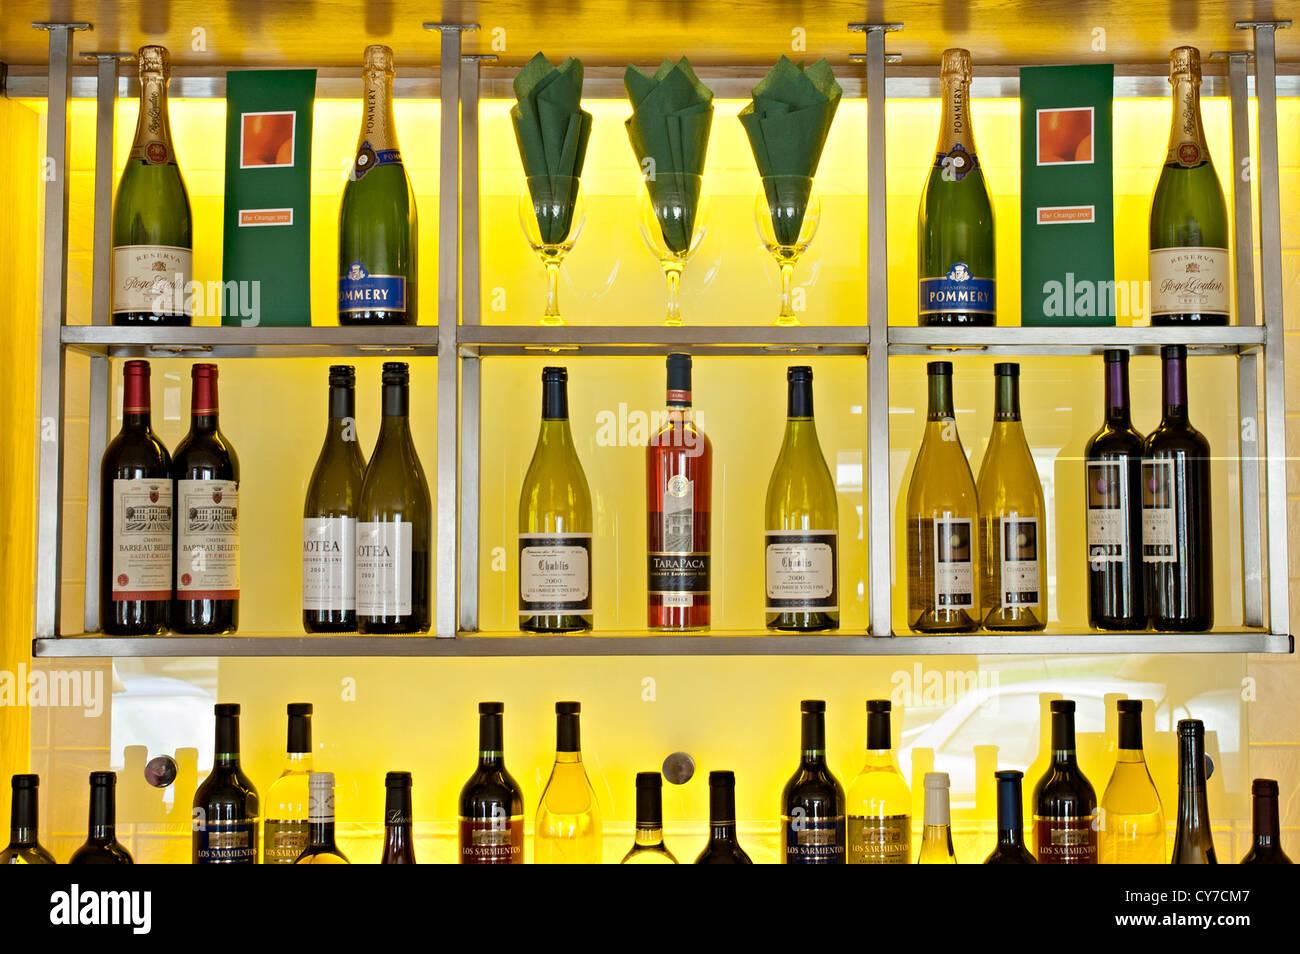 Bar Shelves Stockfotos & Bar Shelves Bilder - Alamy